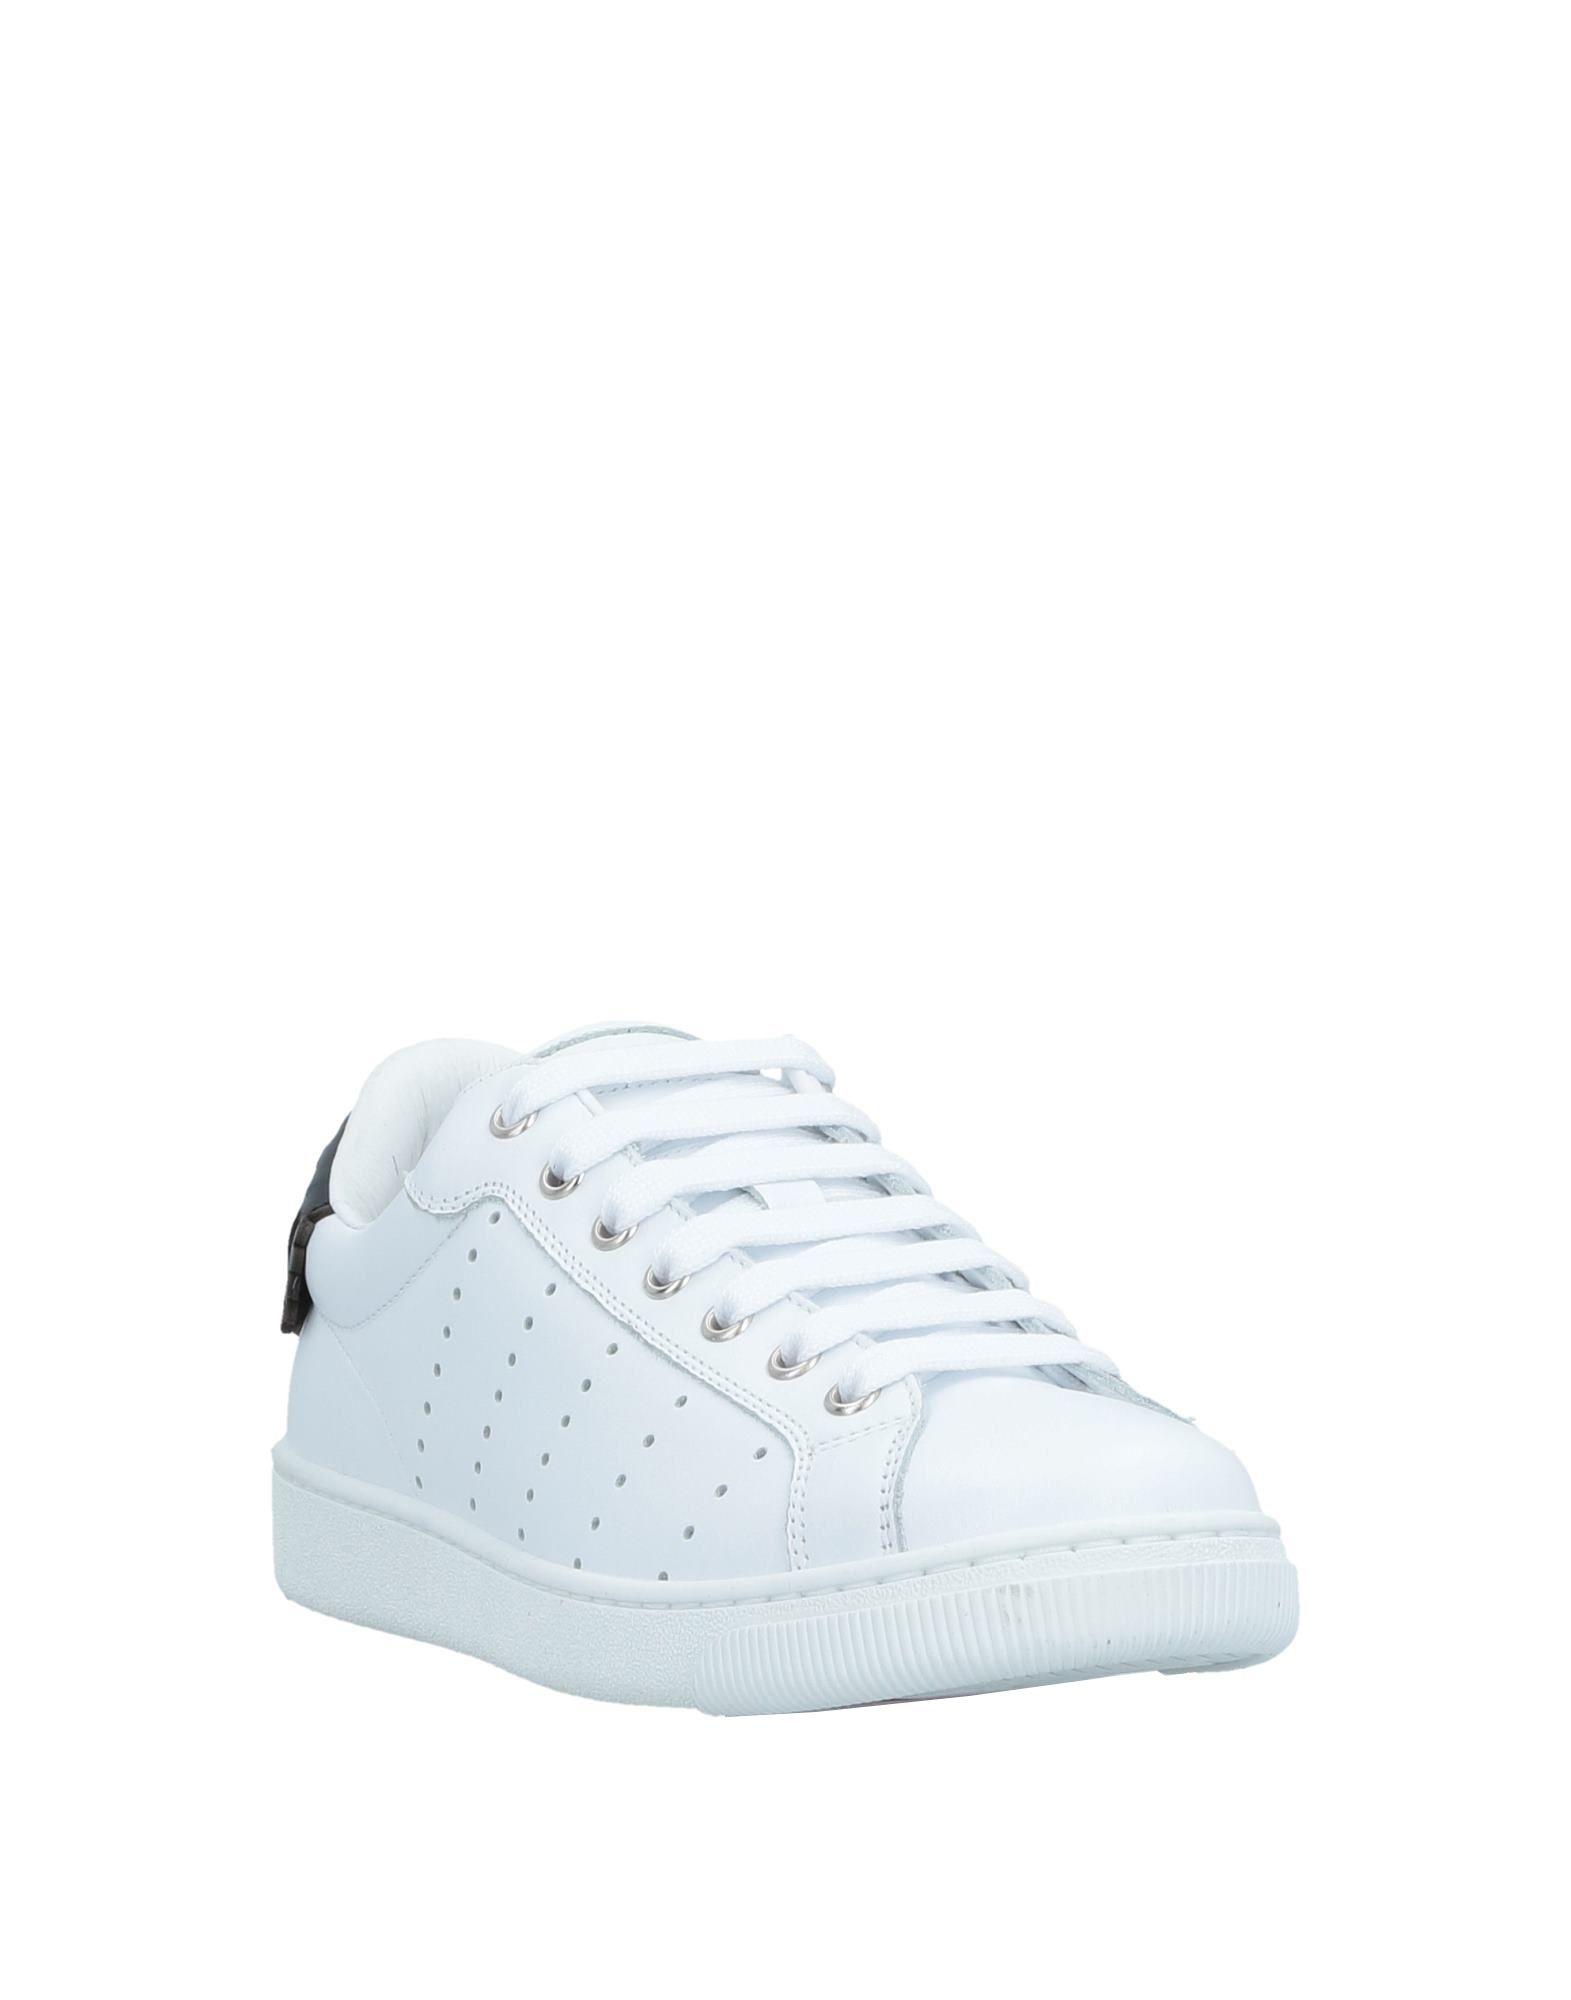 Rabatt Schuhe Sneakers DsquaROT2 Sneakers Schuhe Damen  11517013UV 792b21